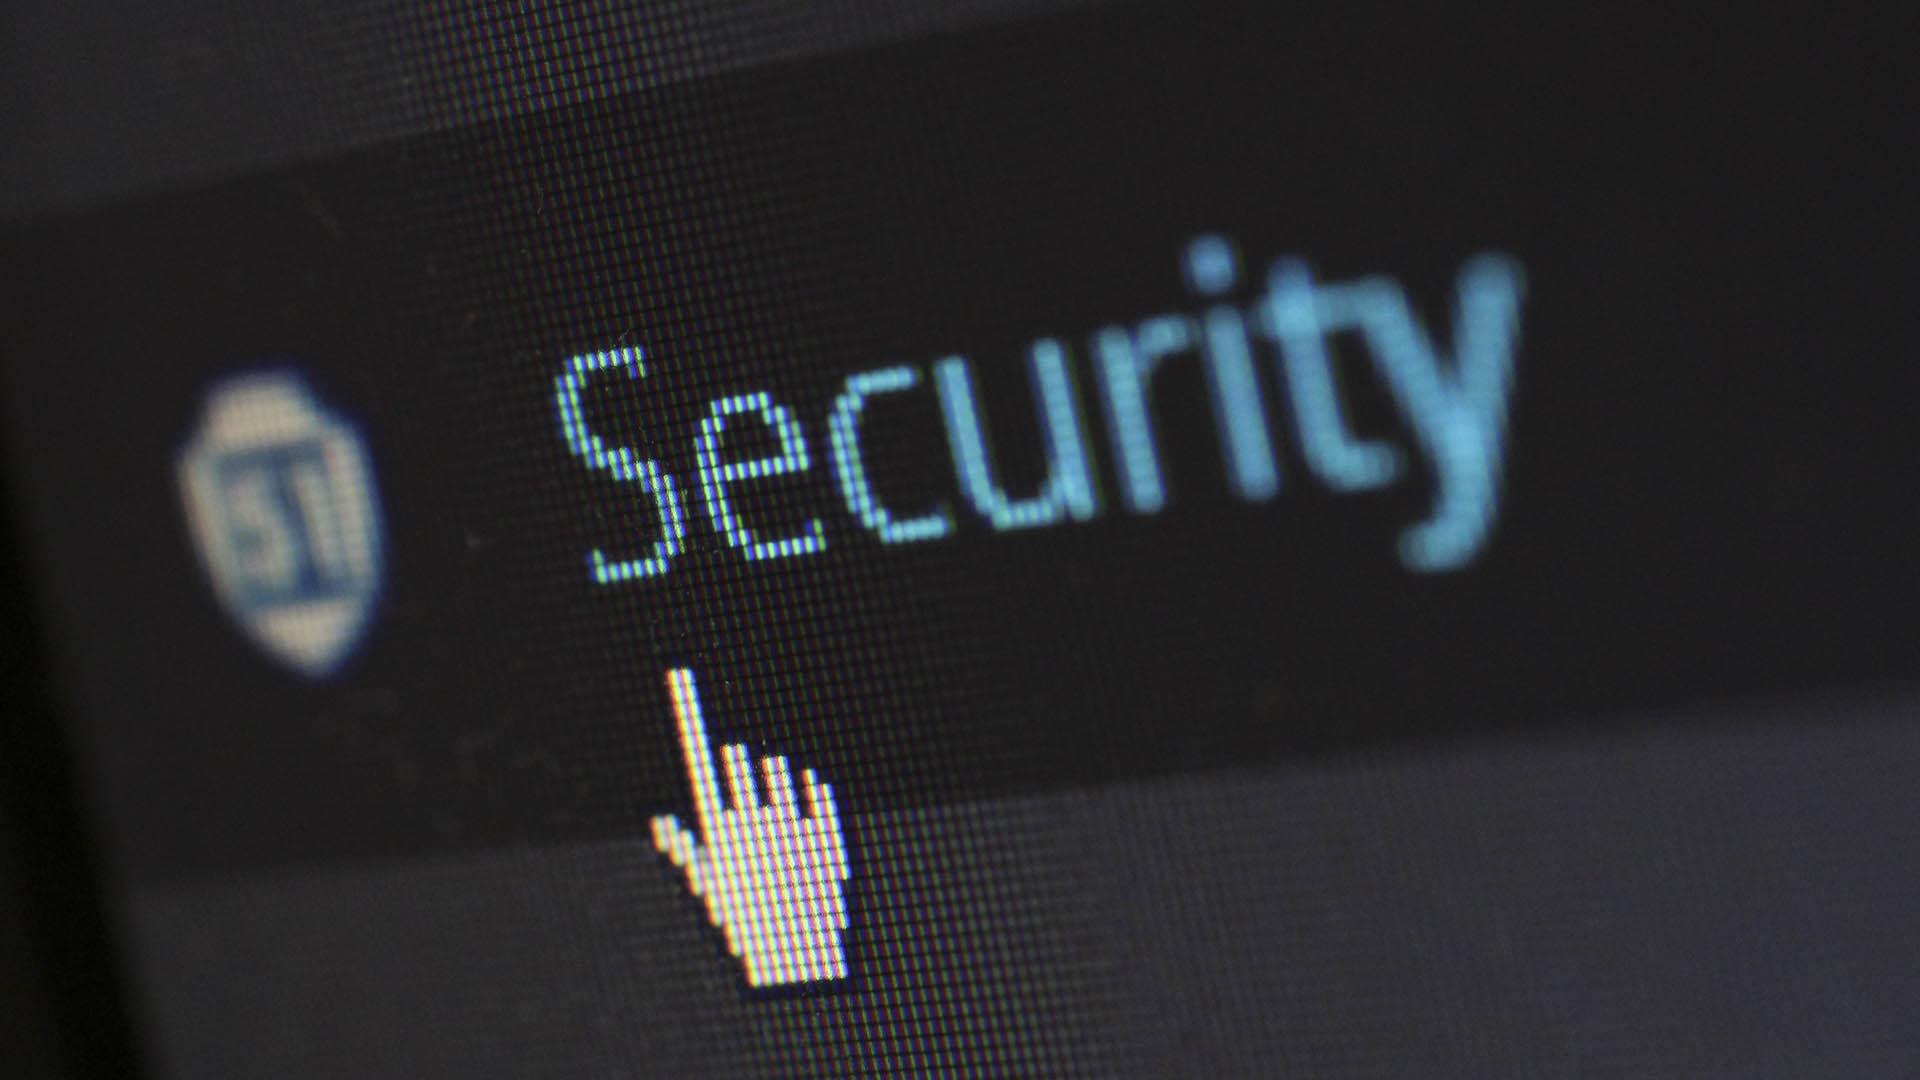 Security-1920-1080